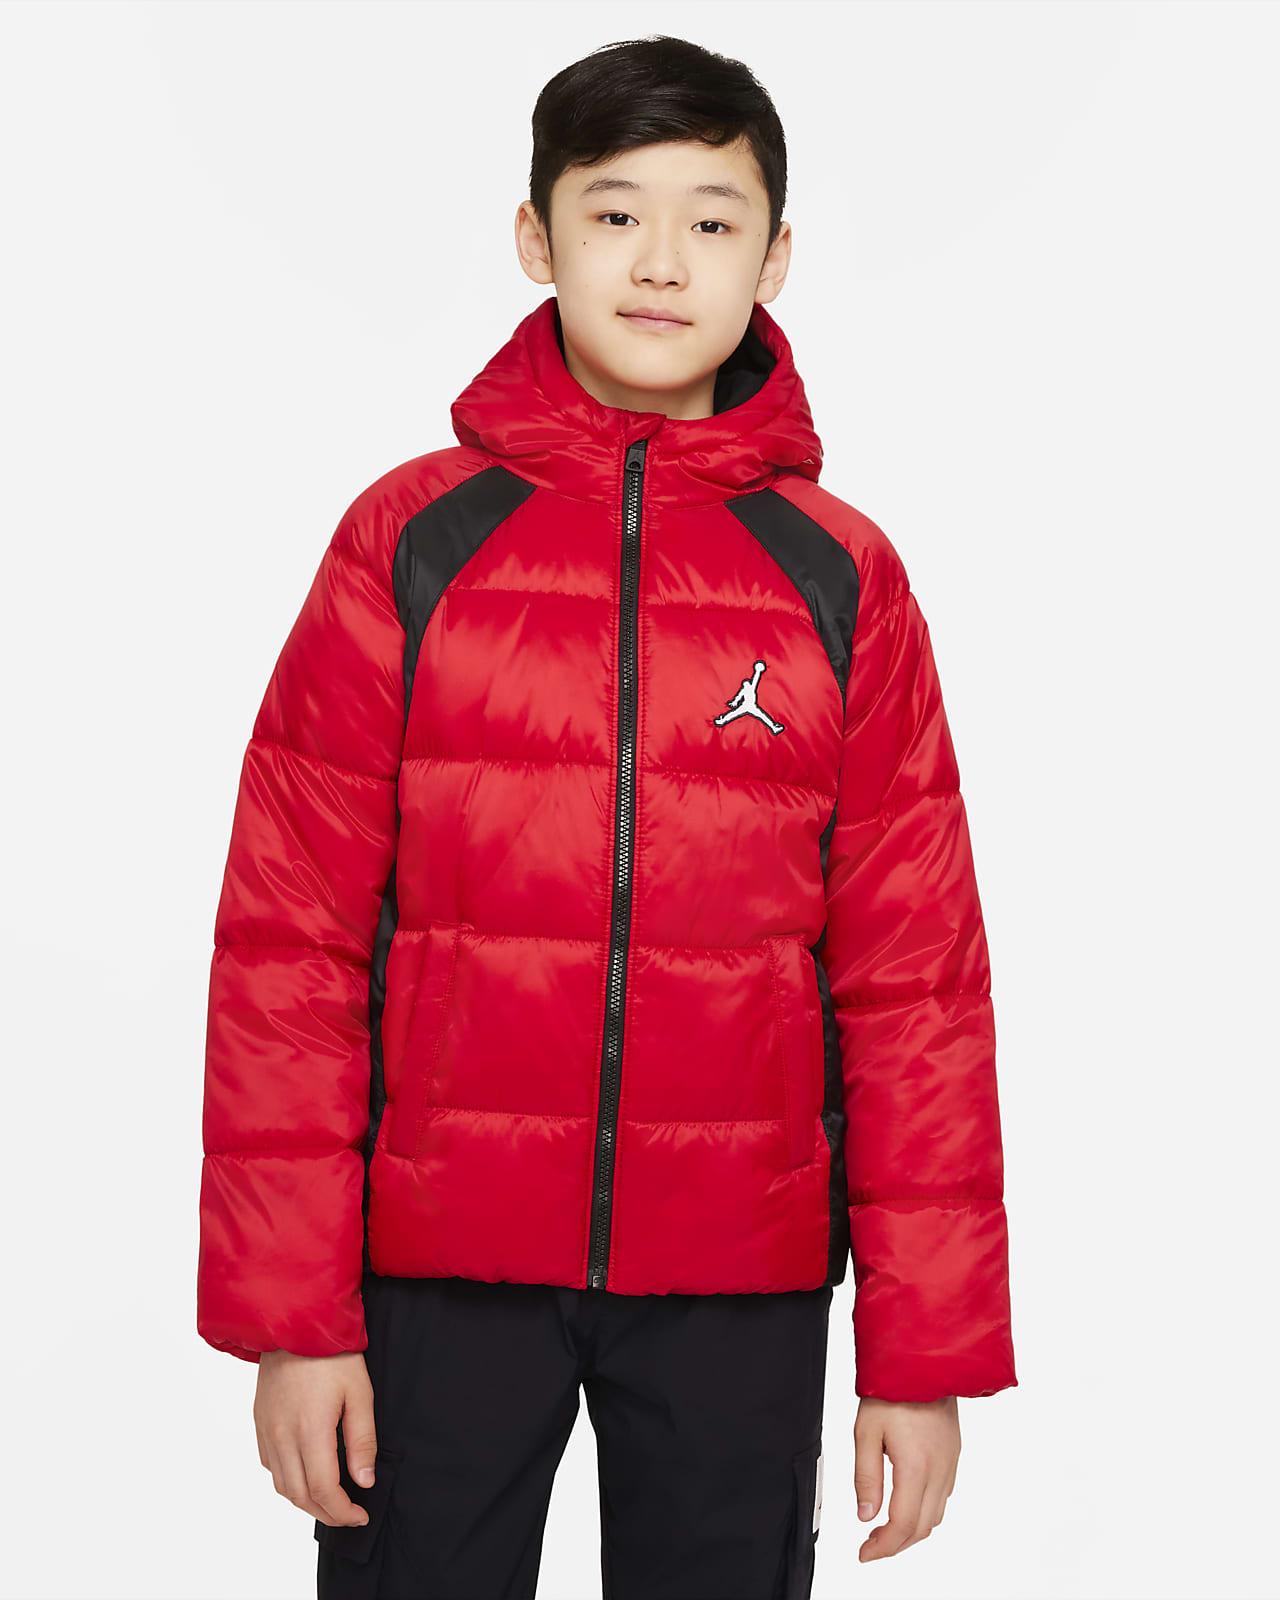 Jordan Older Kids' (Boys') Puffer Jacket